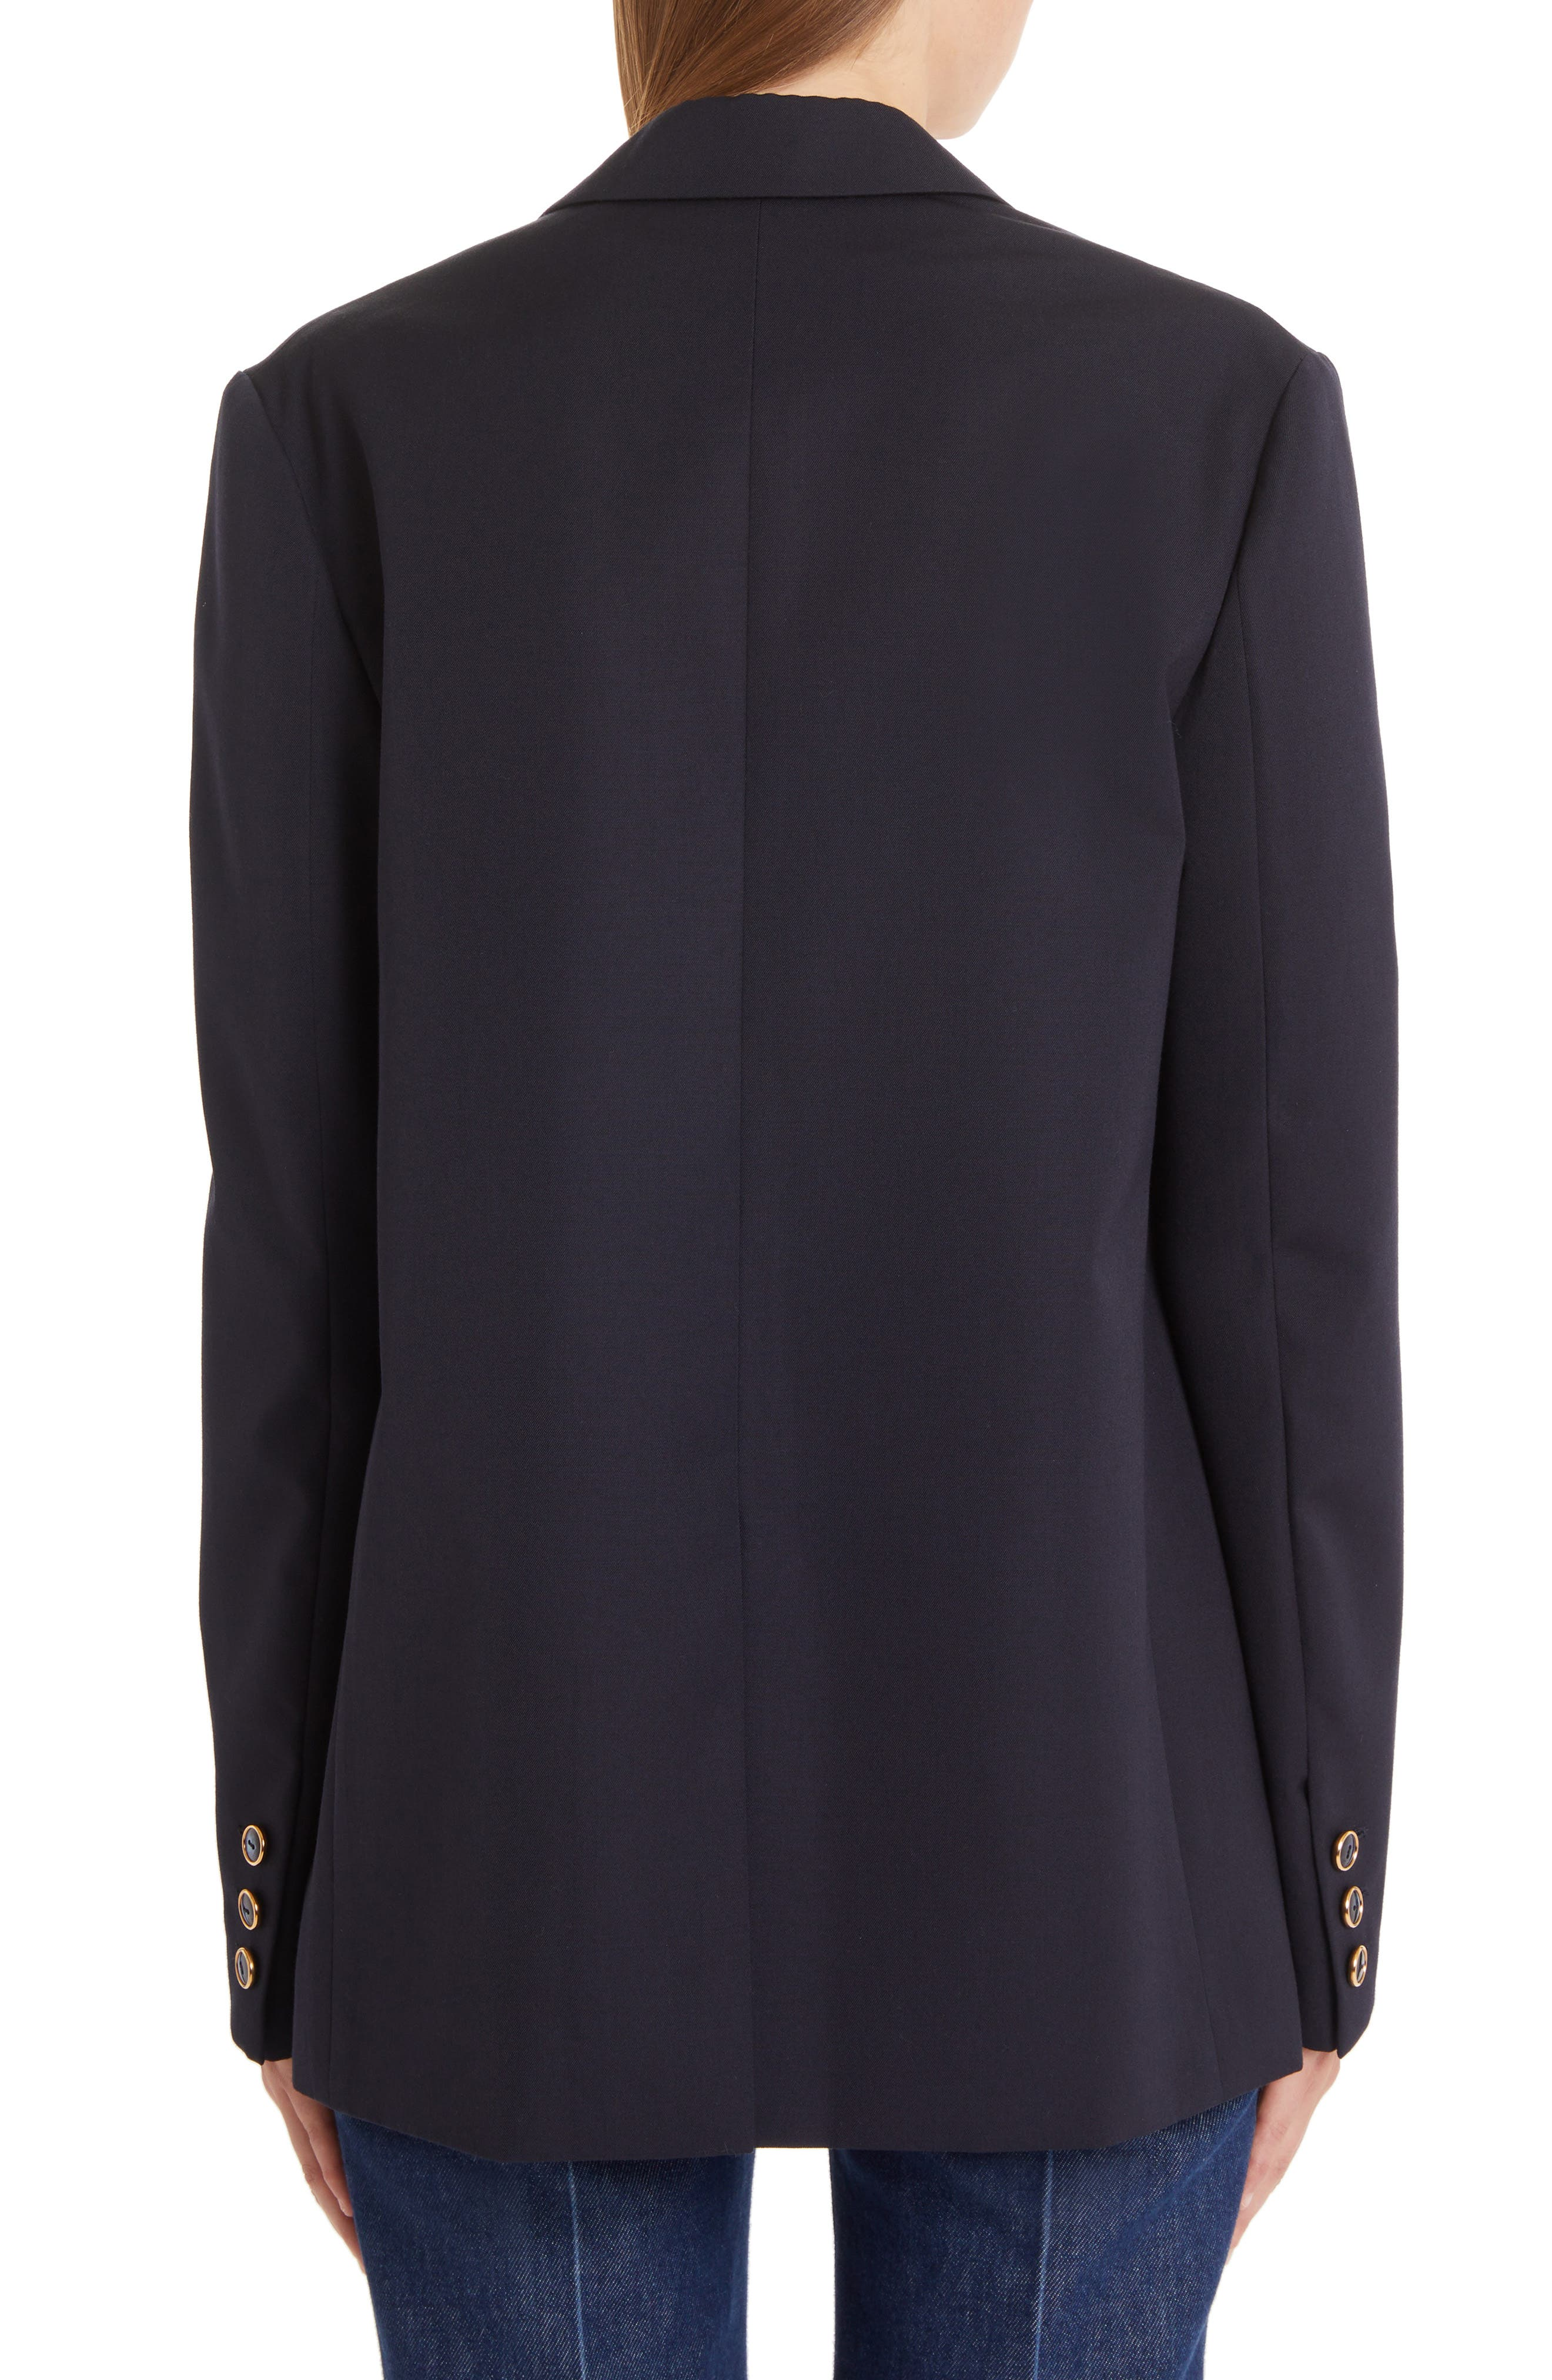 VALENTINO, V-Detail Wool Gabardine Jacket, Alternate thumbnail 2, color, NAVY